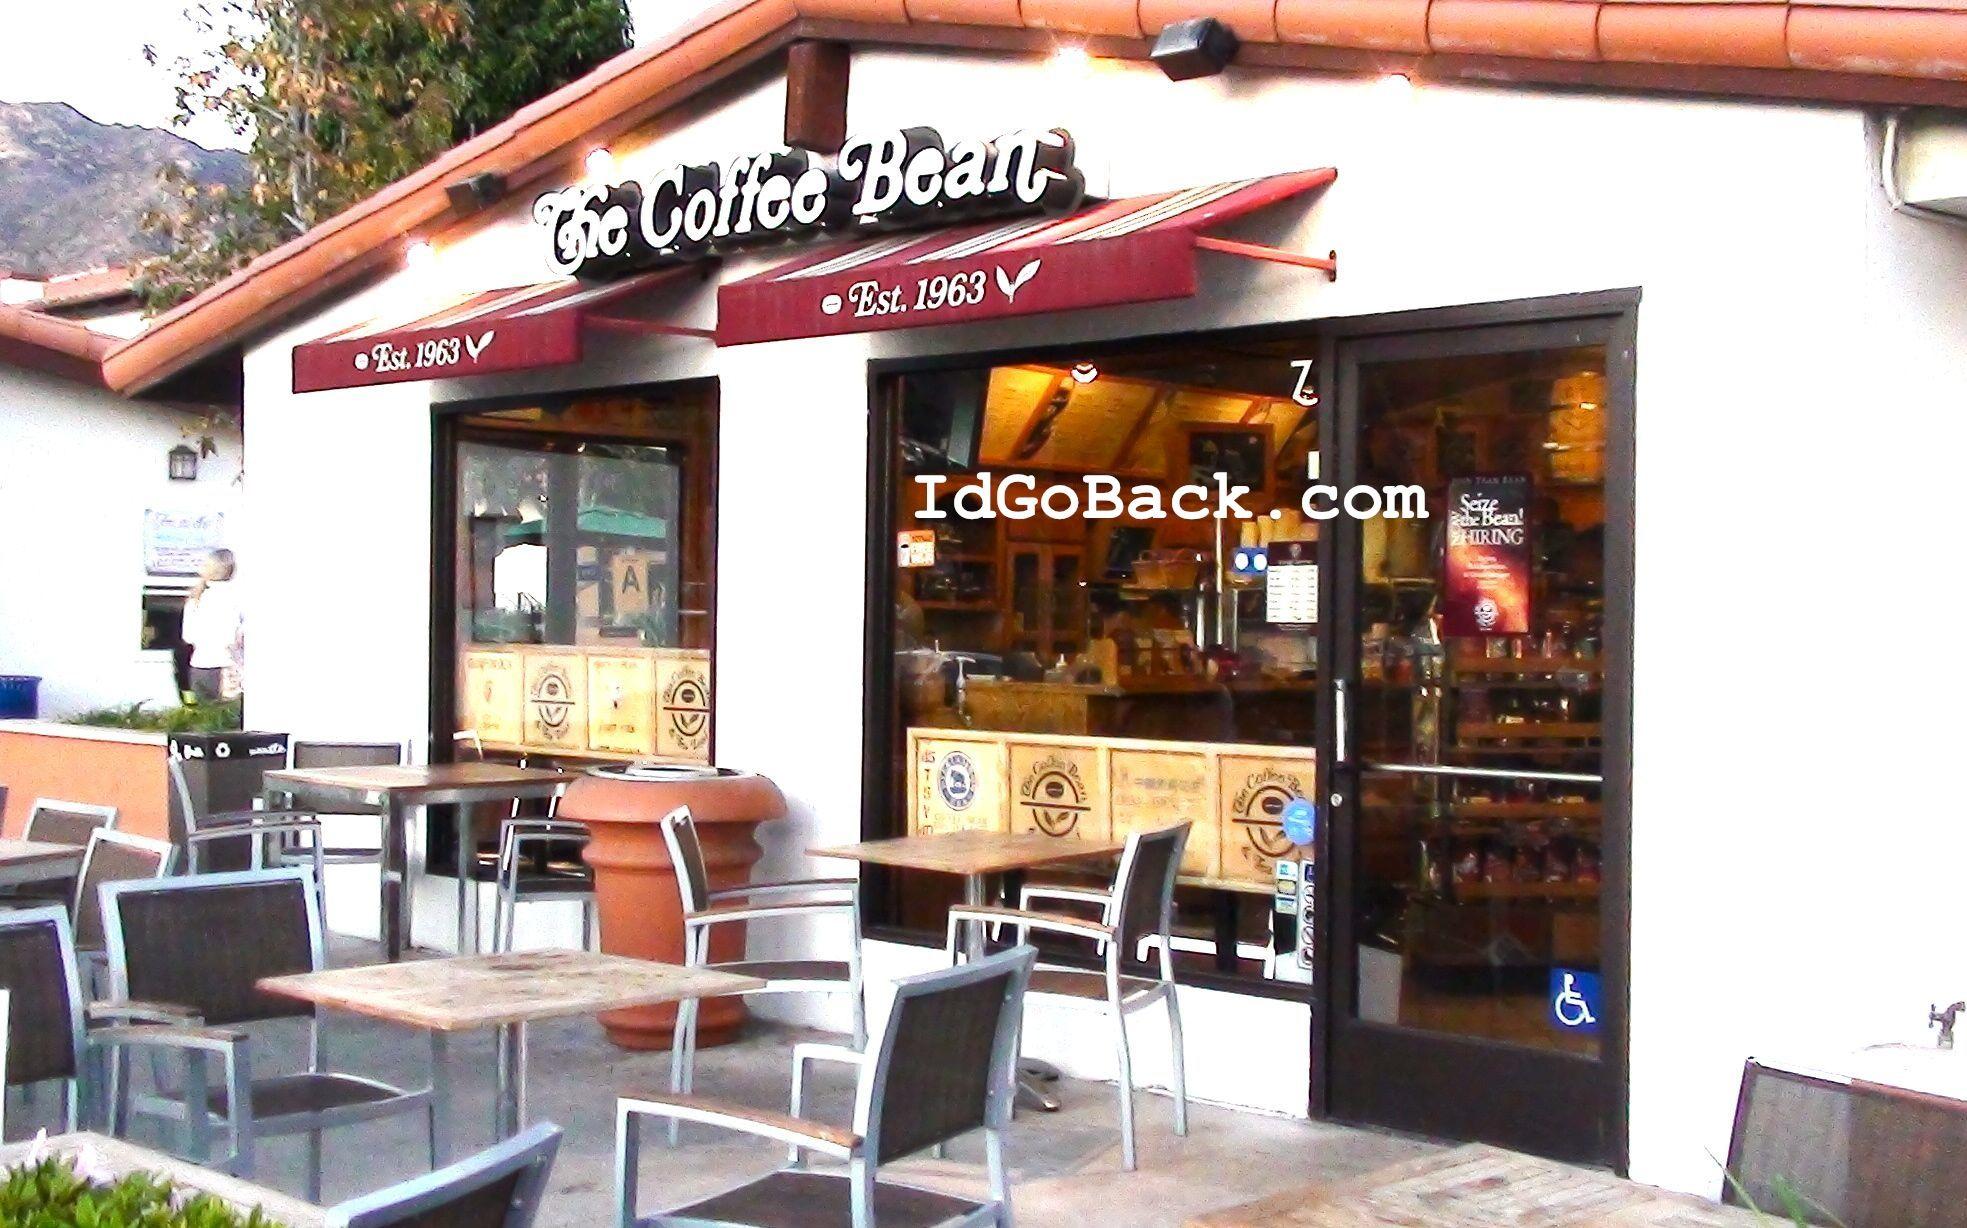 Coffee Bean And Tea Leaf In Malibu Beach California Located At The Hollywood Celebrity Favorite Hangout The Malibu Co Coffee Beans Tea Leaves Malibu Beaches